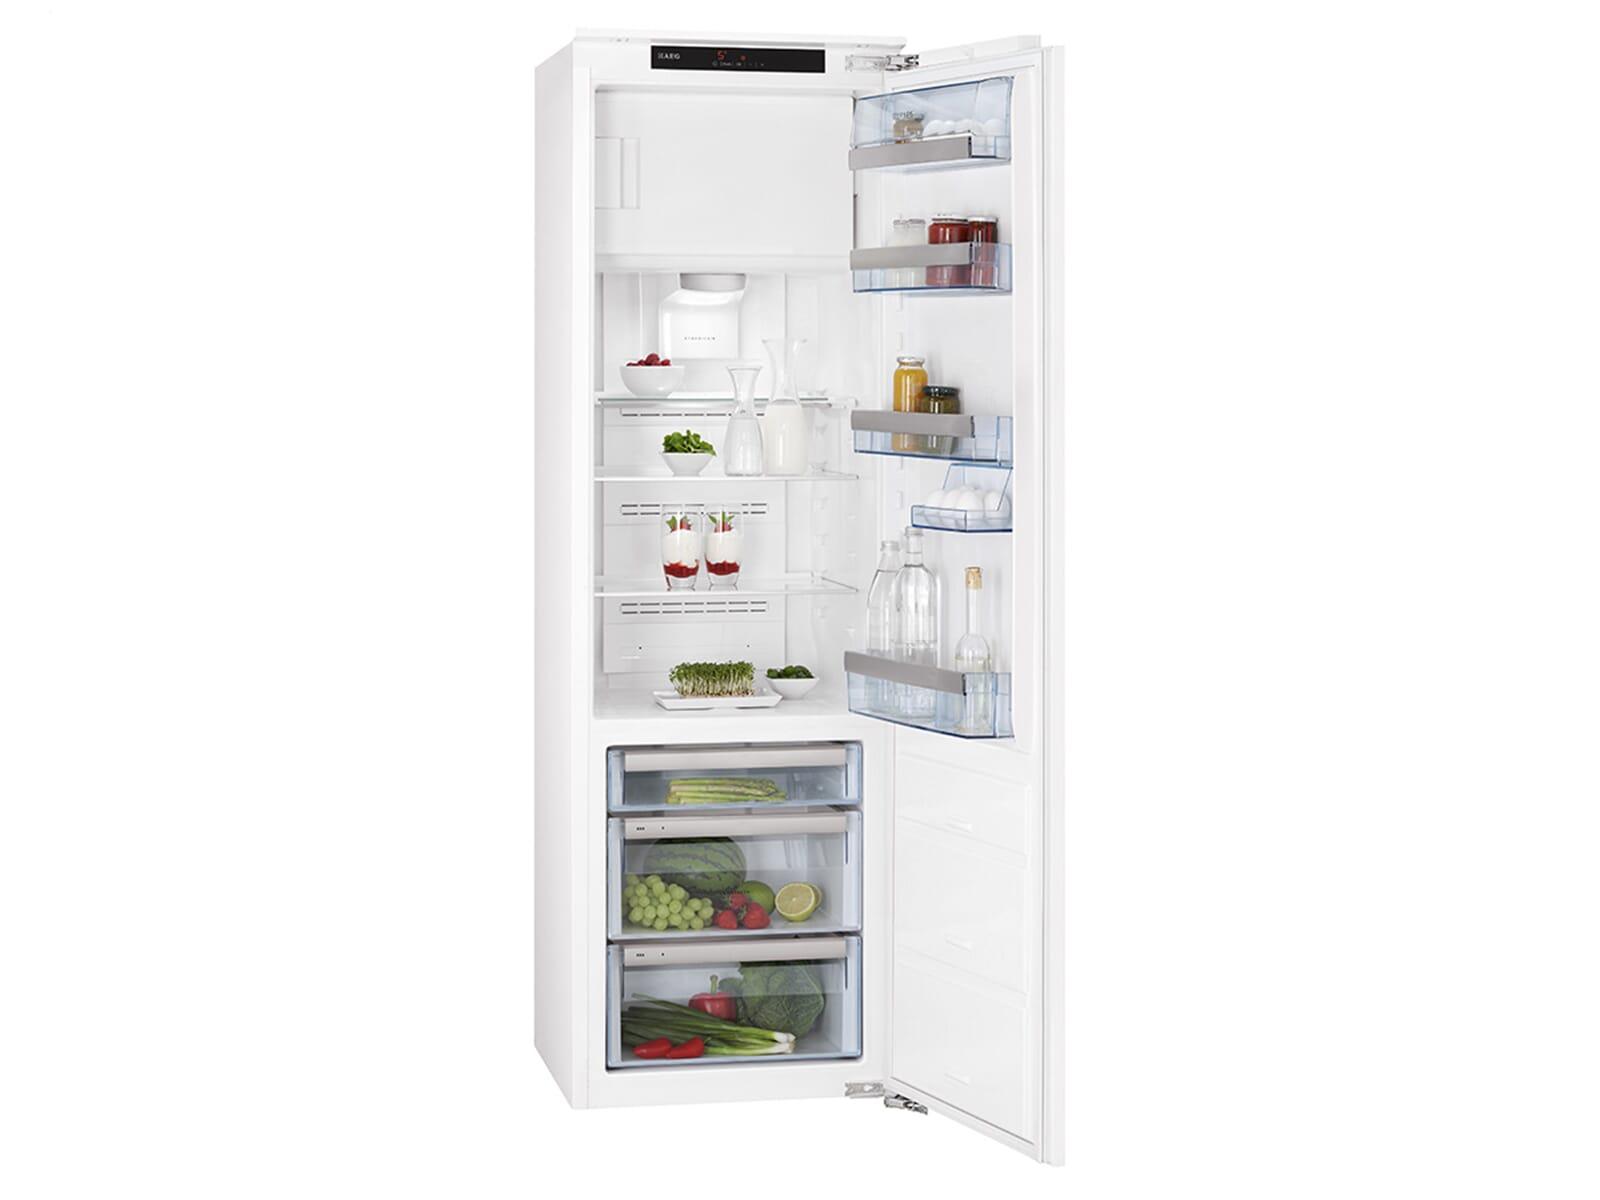 Aeg Kühlschrank Coolmatic : Aeg skz c einbaukühlschrank